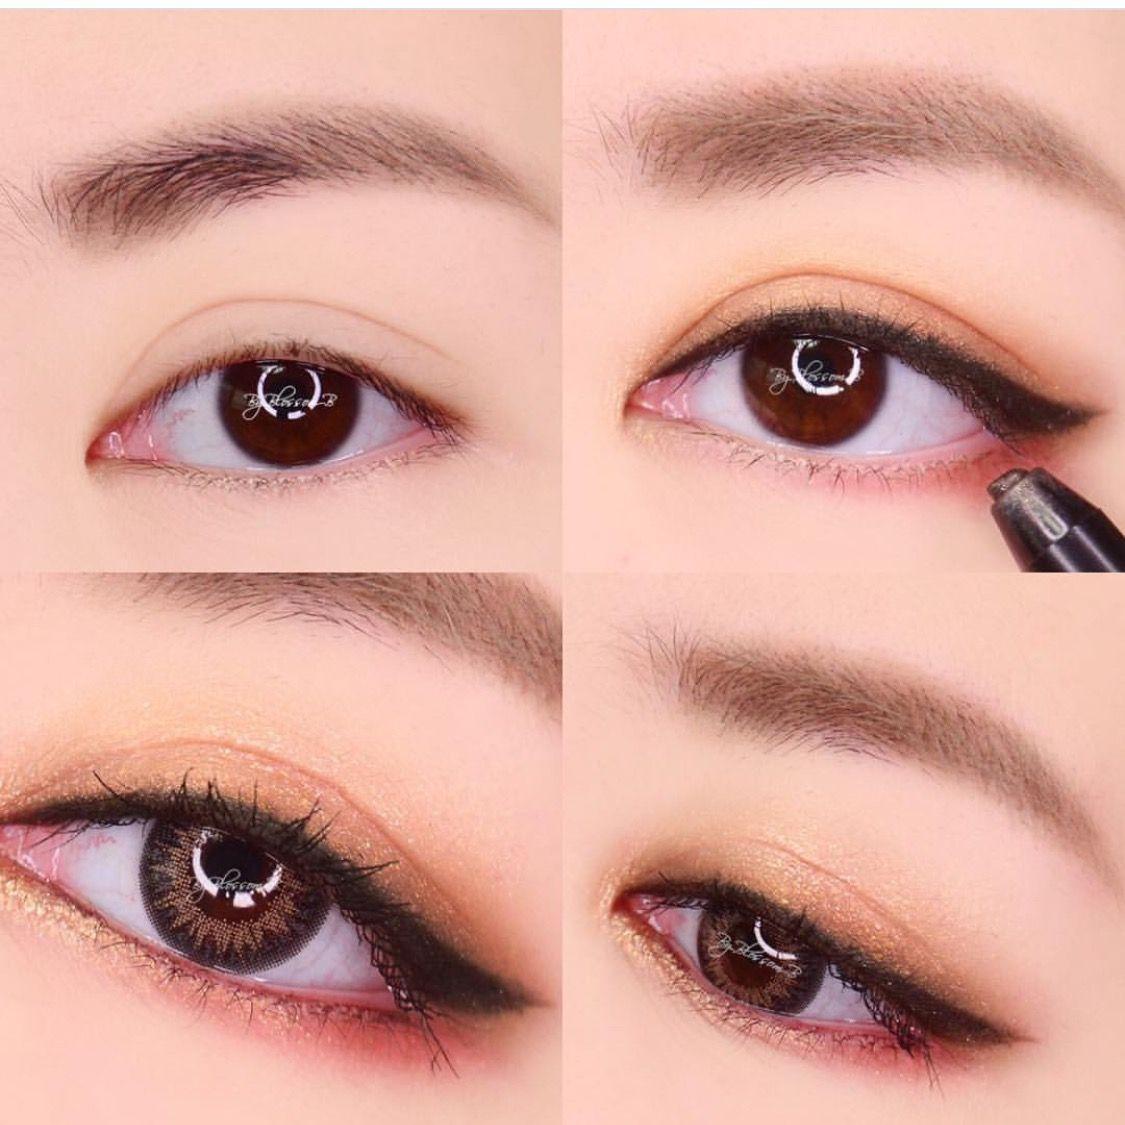 JENNIE insp make up Азиатская макияж глаз, Японский